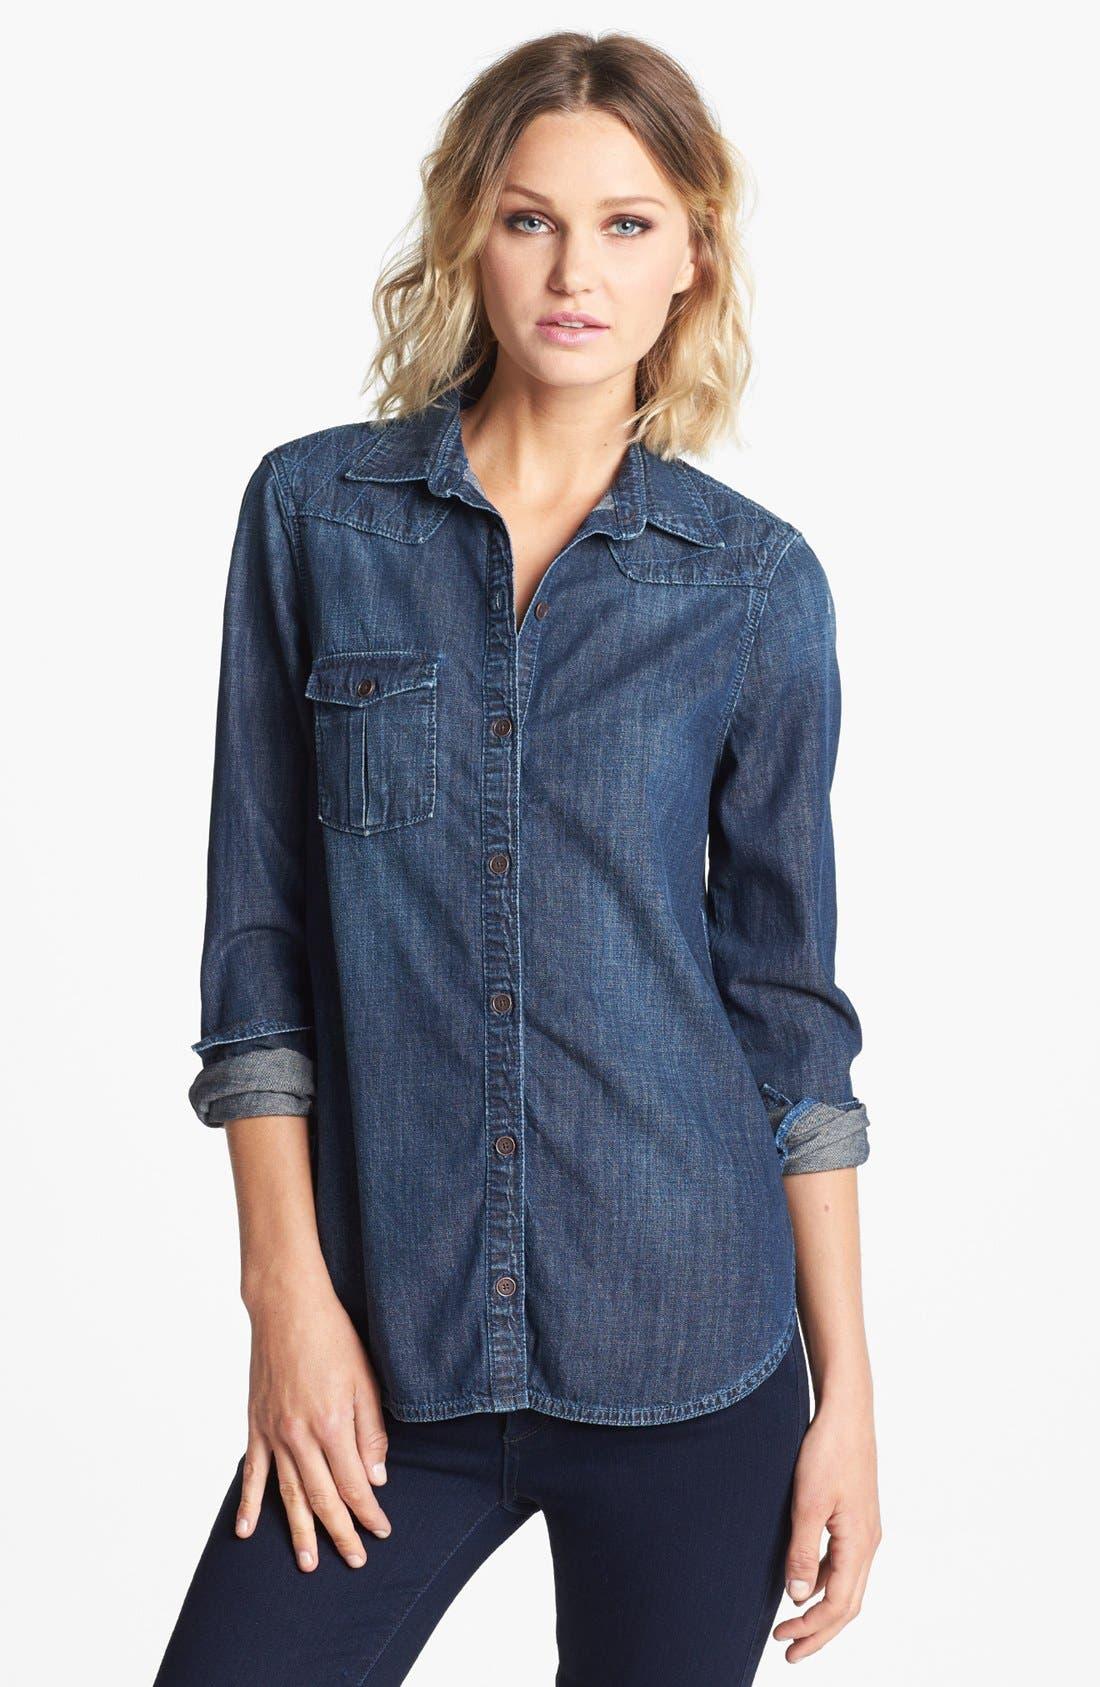 Main Image - Paige Denim 'Brooke' Stitched Yoke Denim Shirt